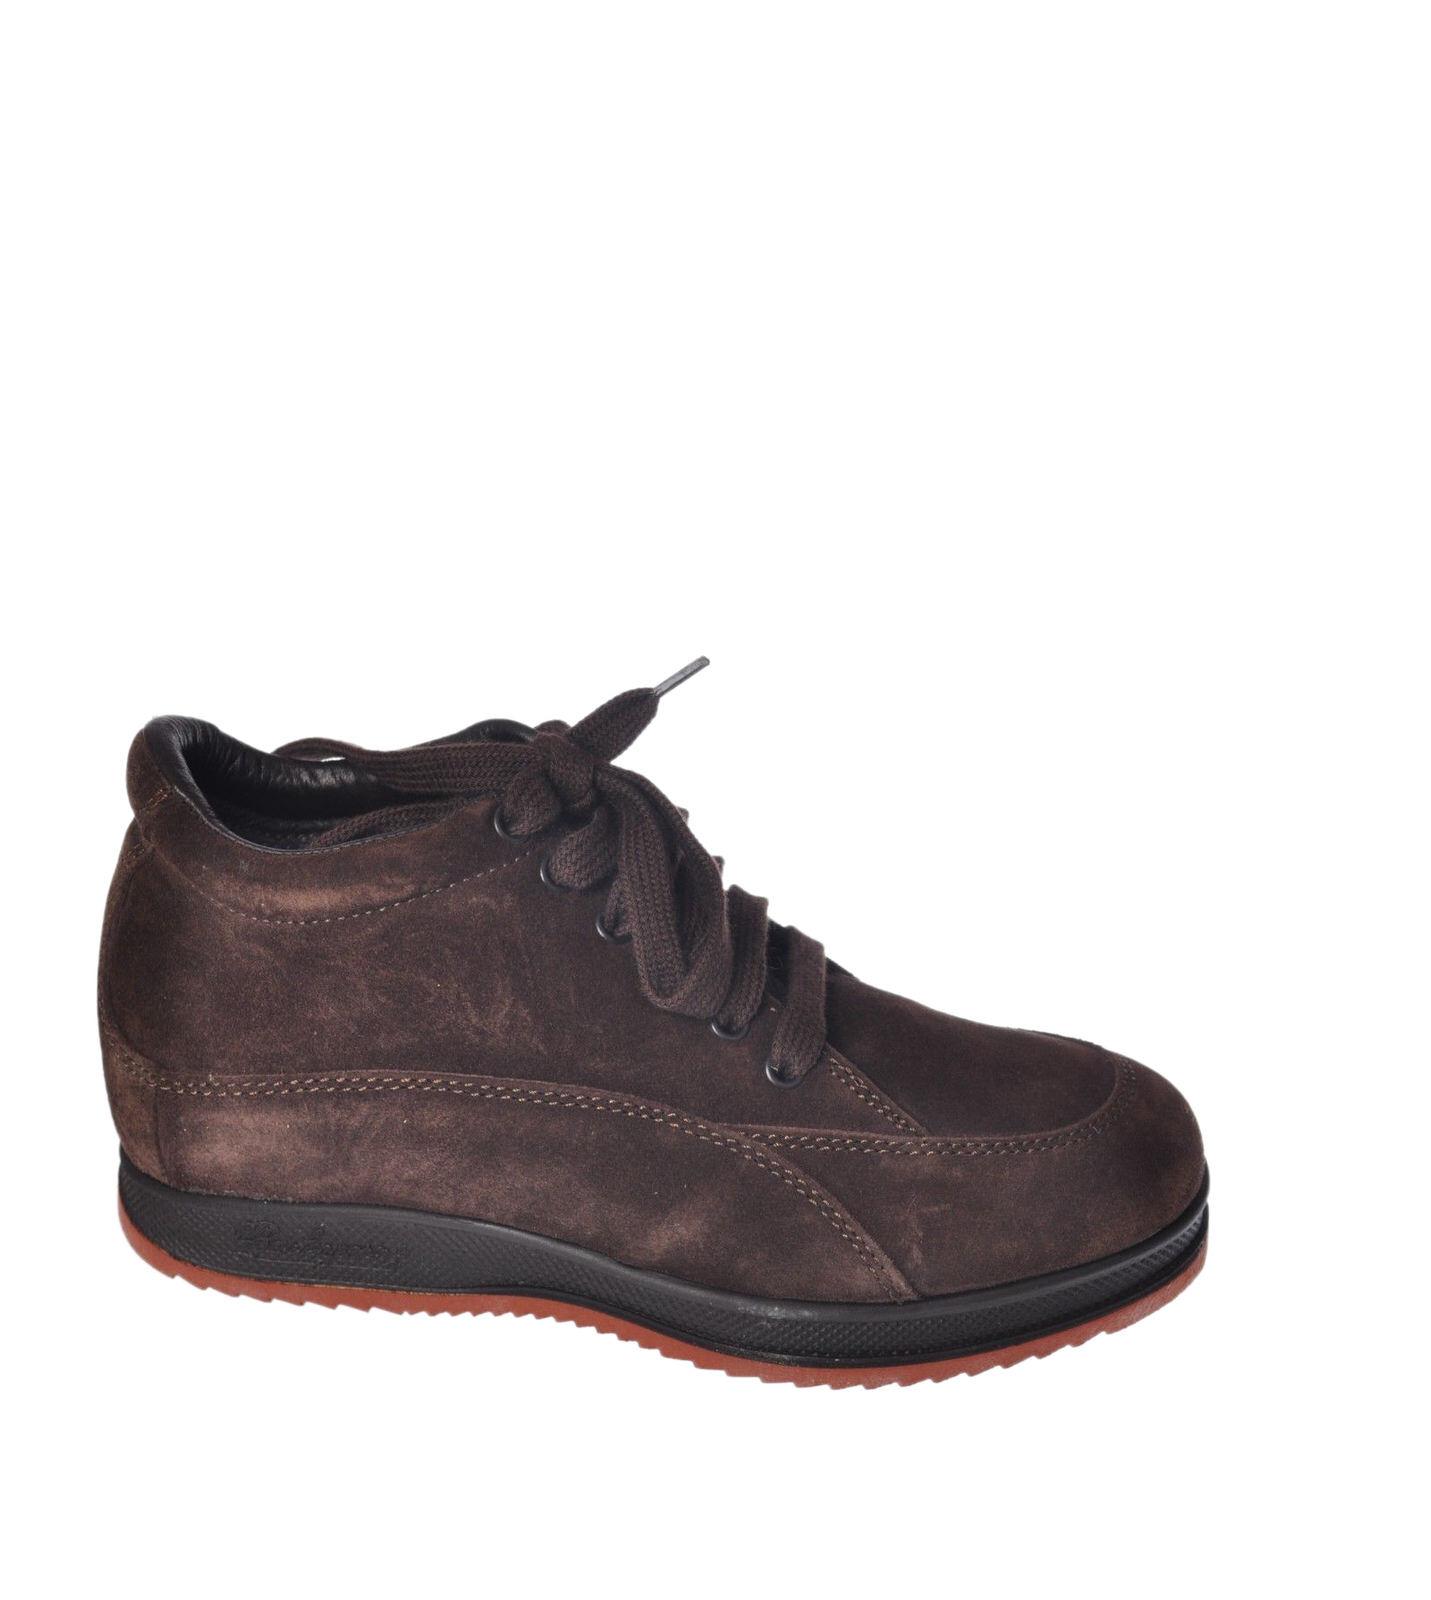 Barleycorn - scarpe-scarpe da ginnastica - Woman - Marronee - 5145520C183729